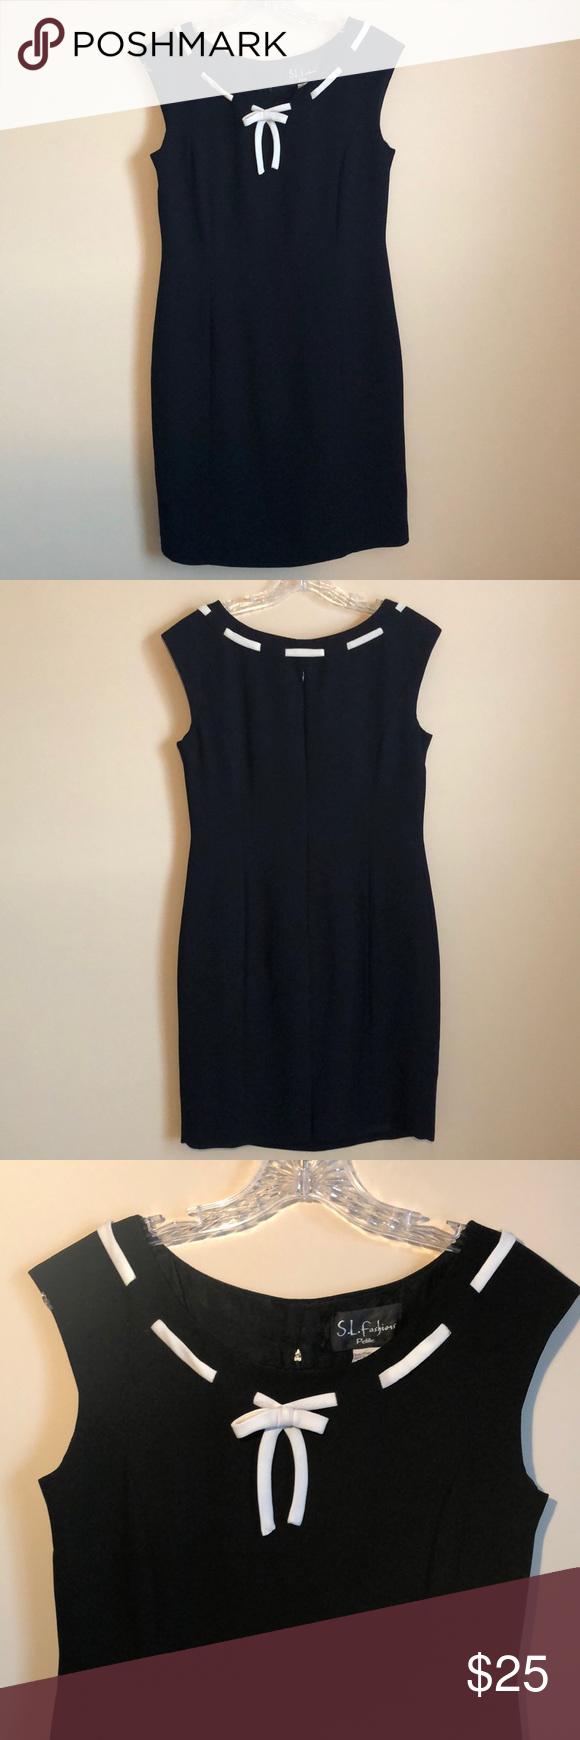 Women S Petite Black Dress Petite Dress With A White Ribbon Neck Line And A Zipper On The Back S L Fashions D Petite Black Dresses Black Dress Petite Dresses [ 1740 x 580 Pixel ]